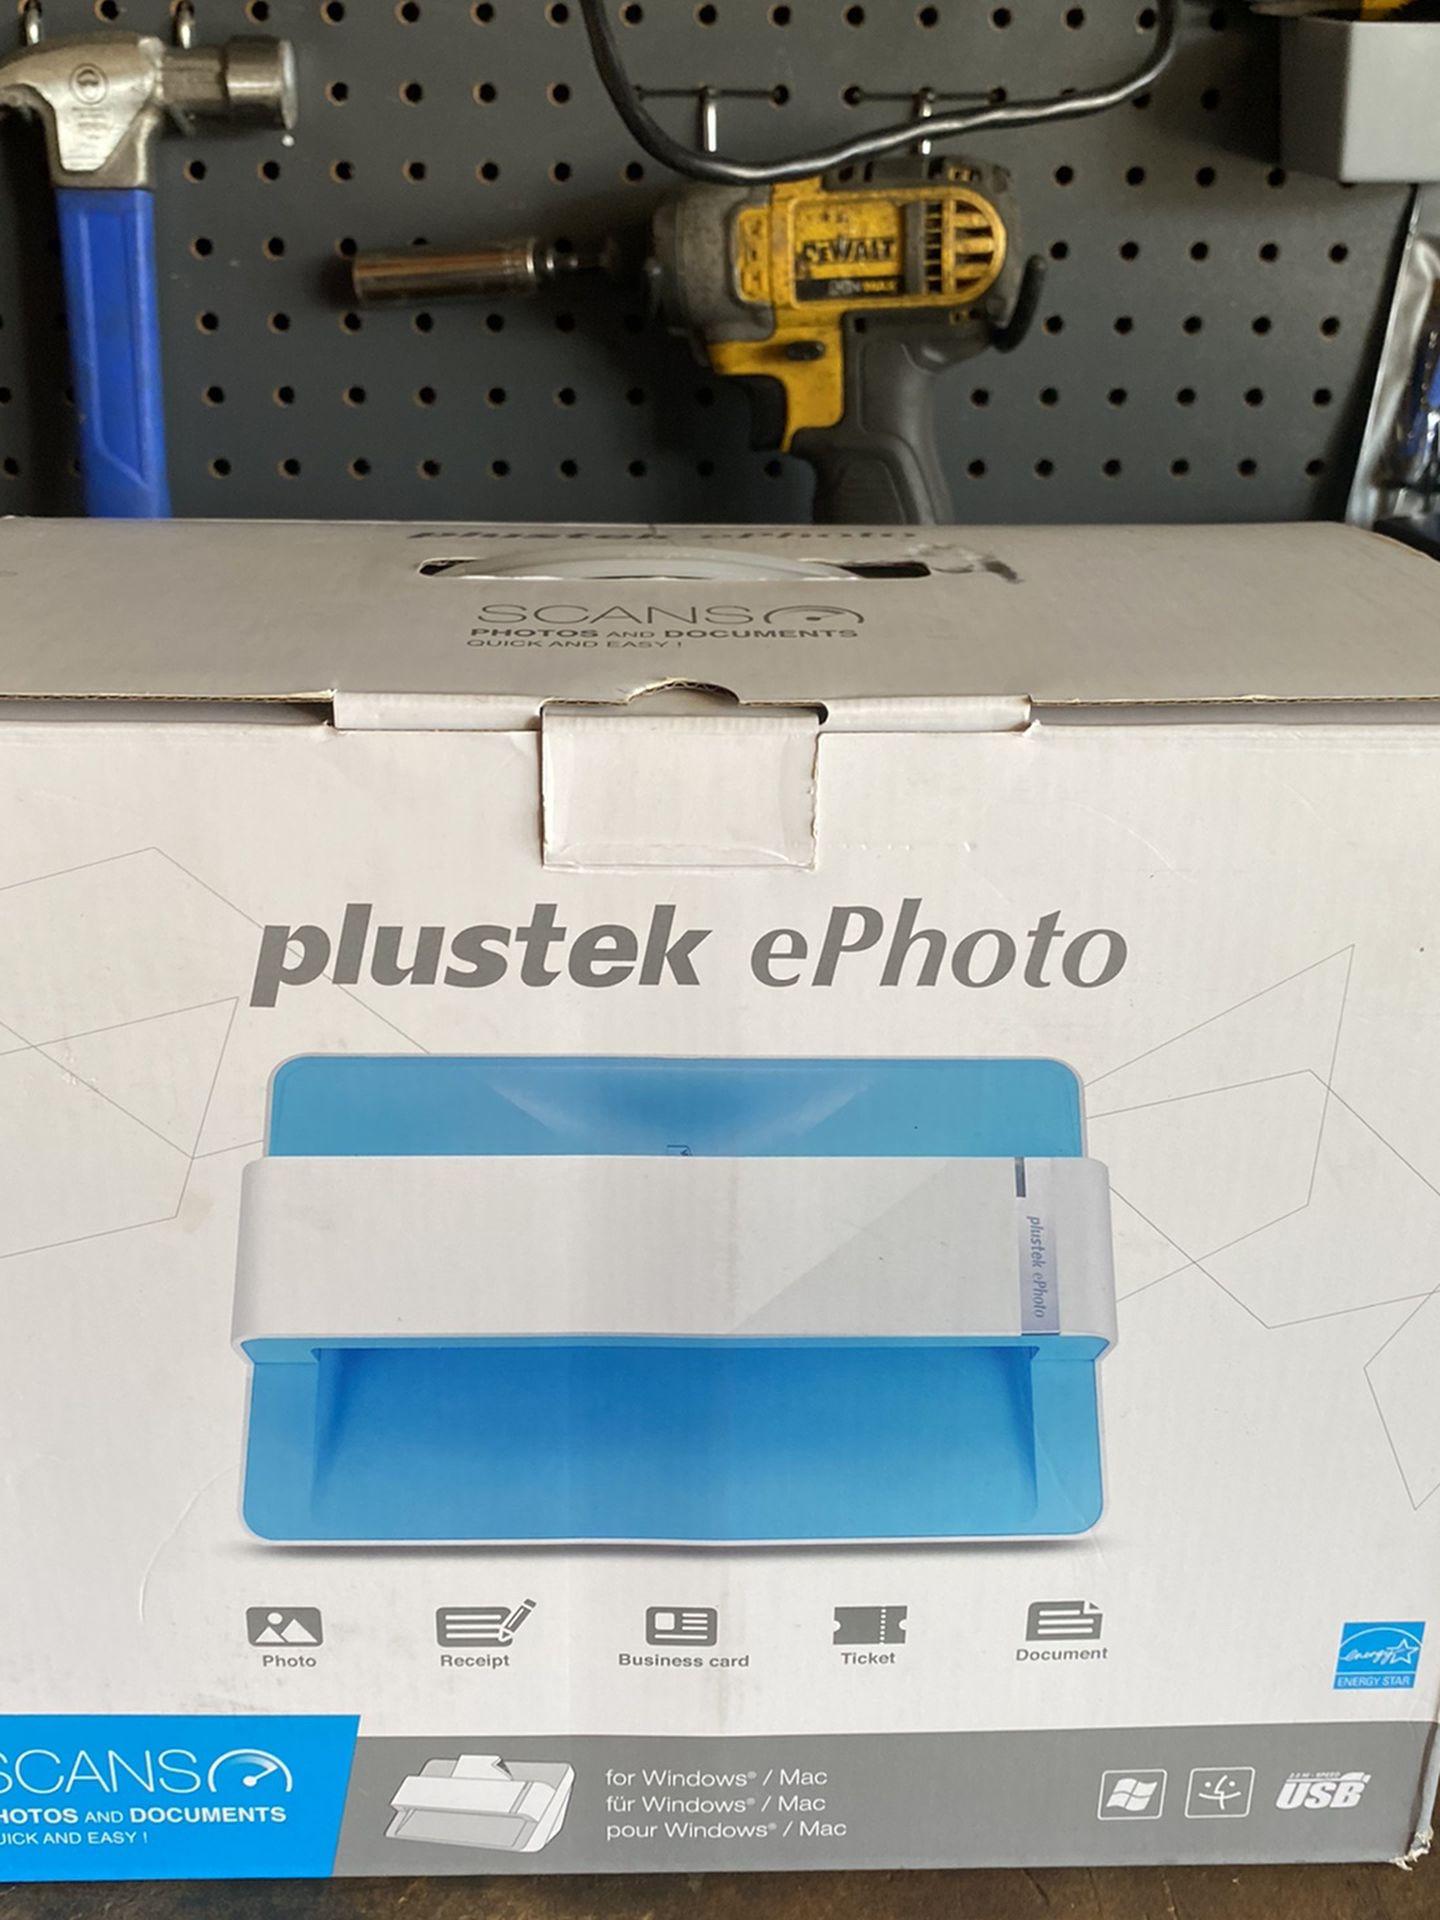 Plustek Photo Scanner - ephoto Z300